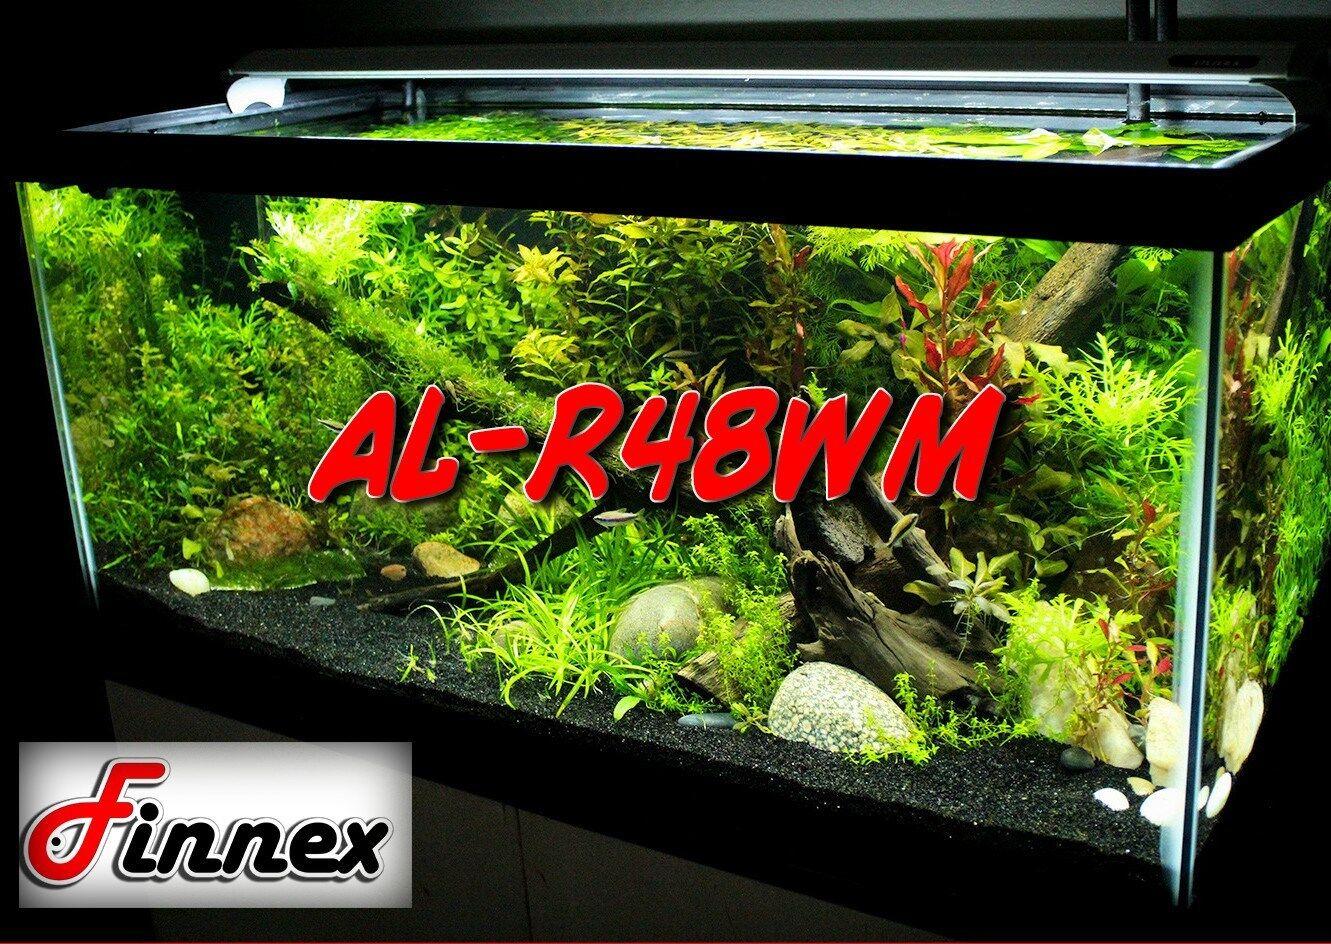 Picture 1 of 4 ... & Finnex FugeRay Planted Aquarium LED Light Plus Moonlights Ultra ... azcodes.com